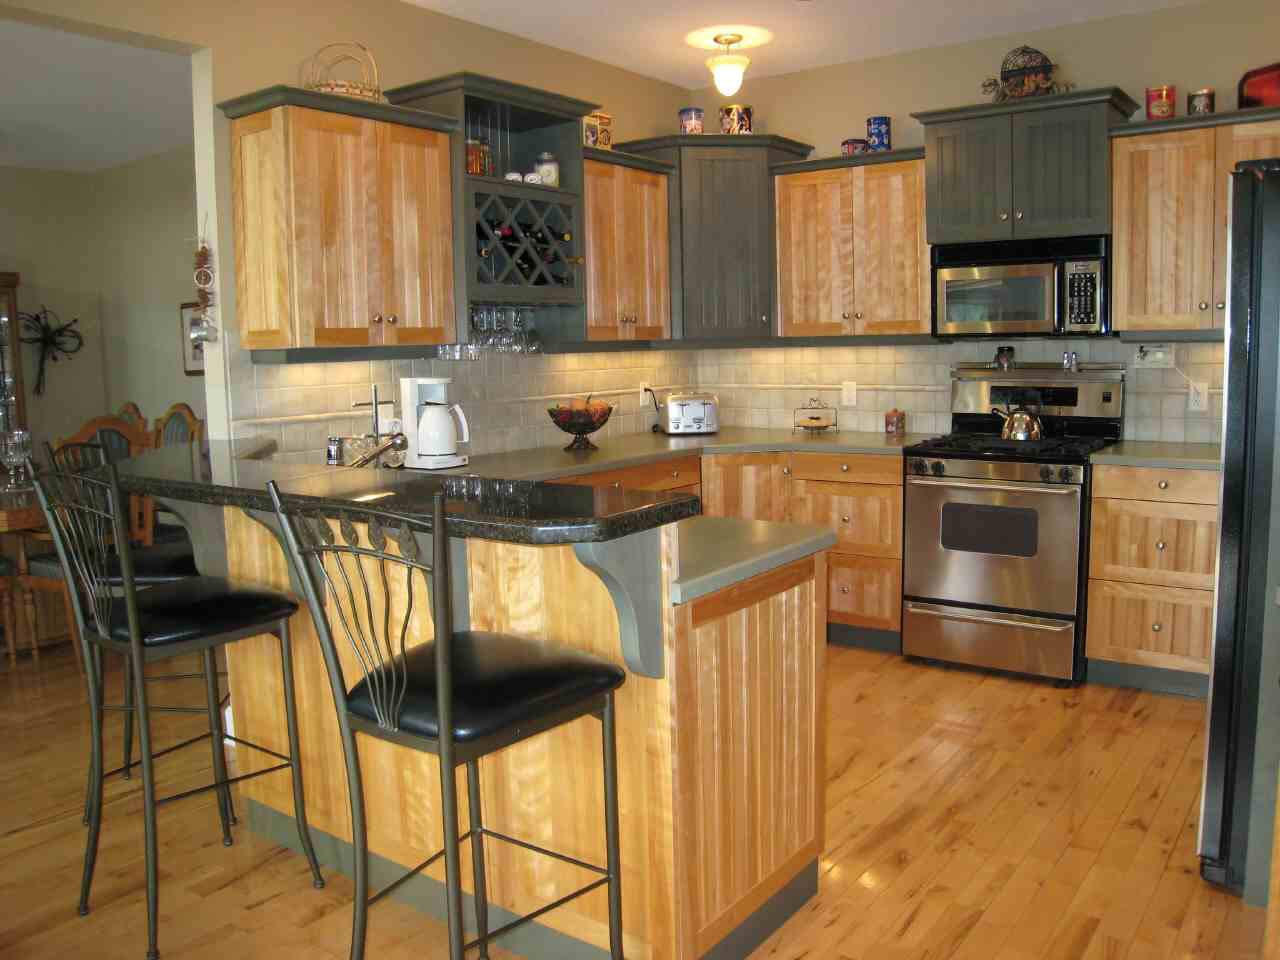 Corner kitchen pantry cabinet Photo - 10